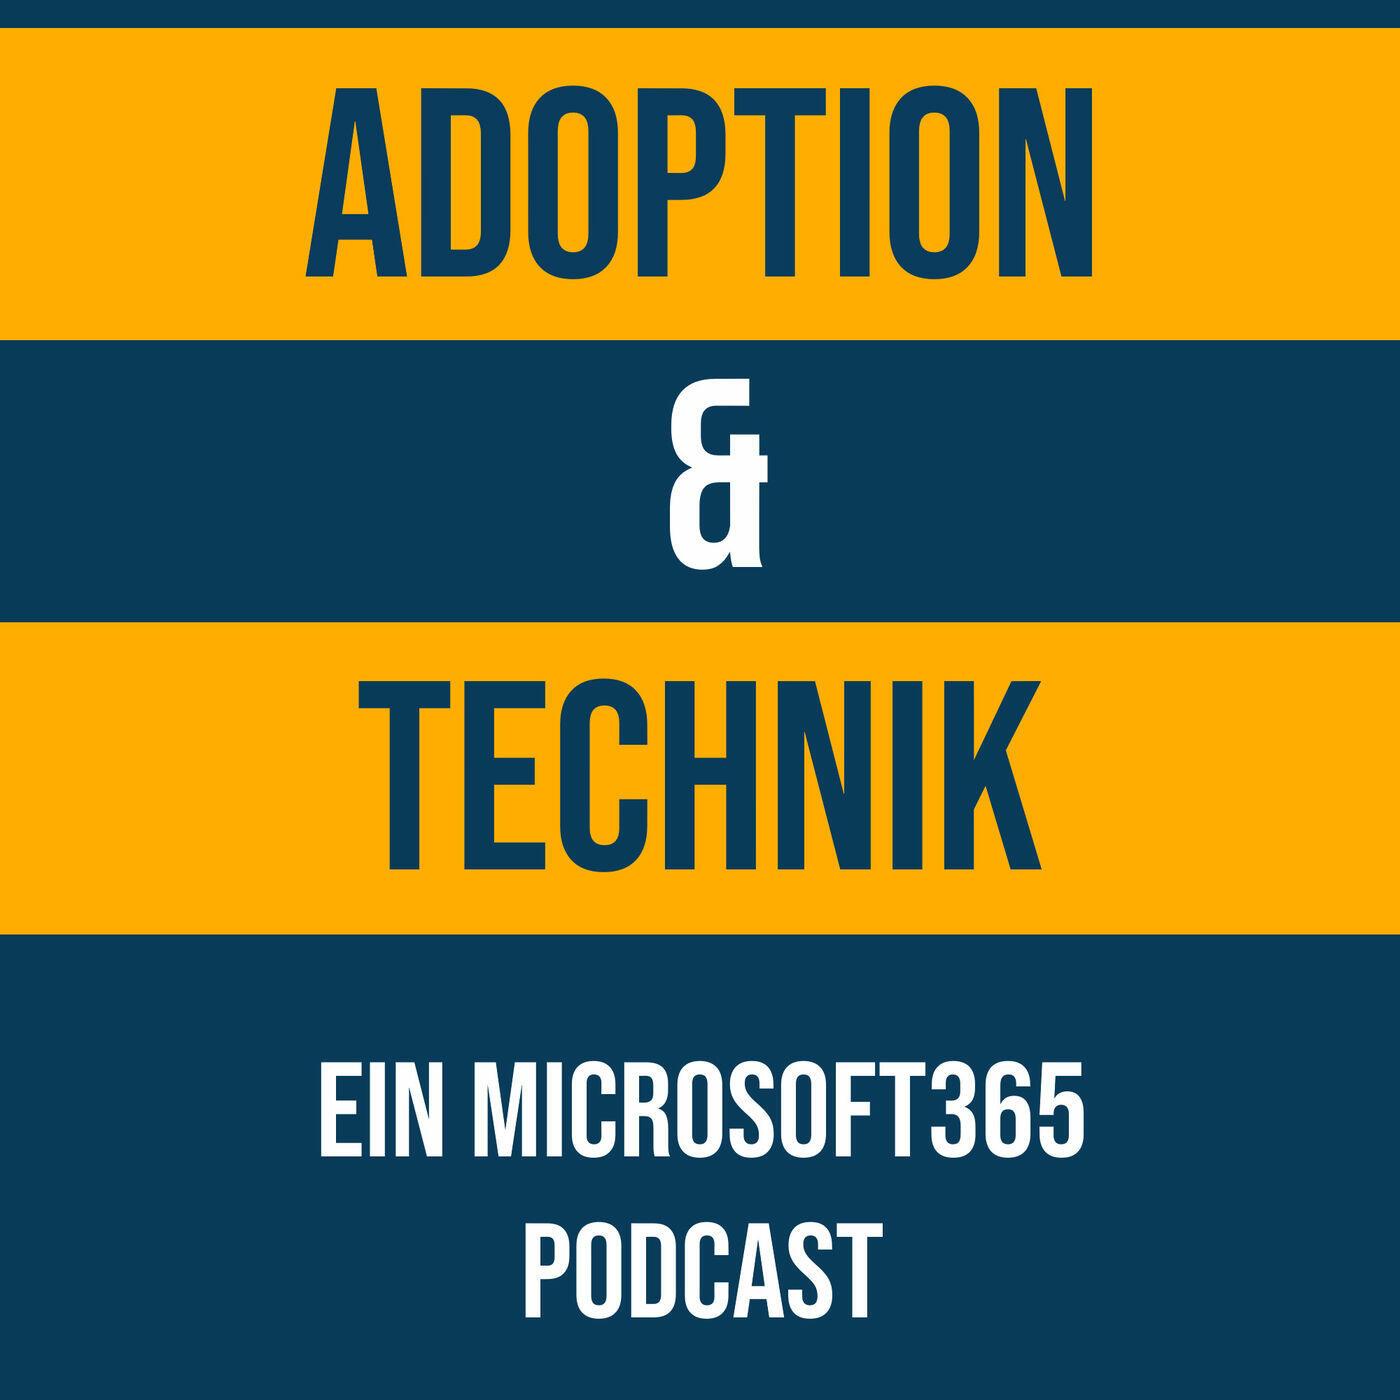 Adoption & Technik - Ein Microsoft 365 Podcast